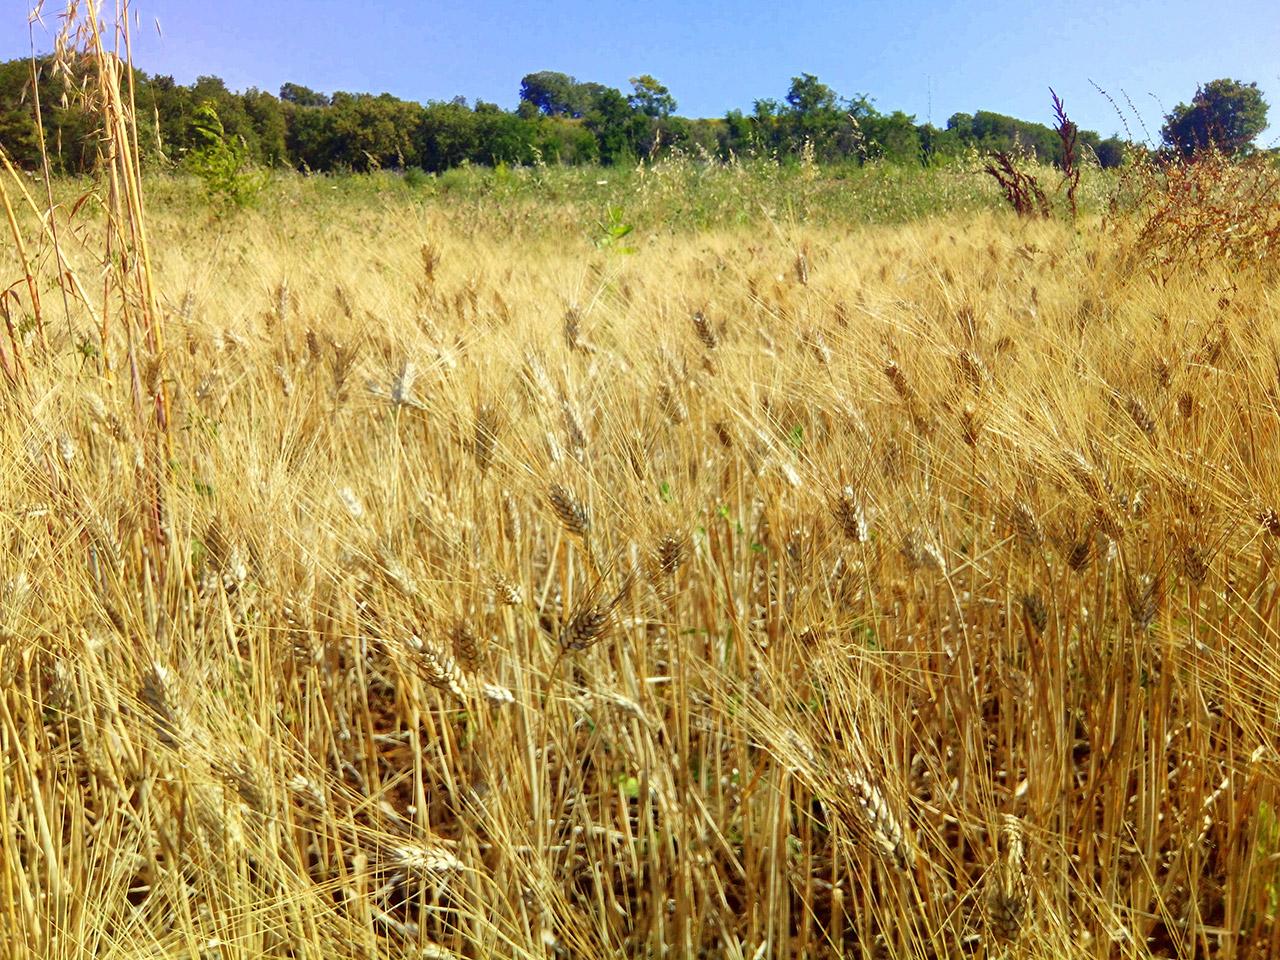 First threshing of the ancient Scorzonera wheat variety